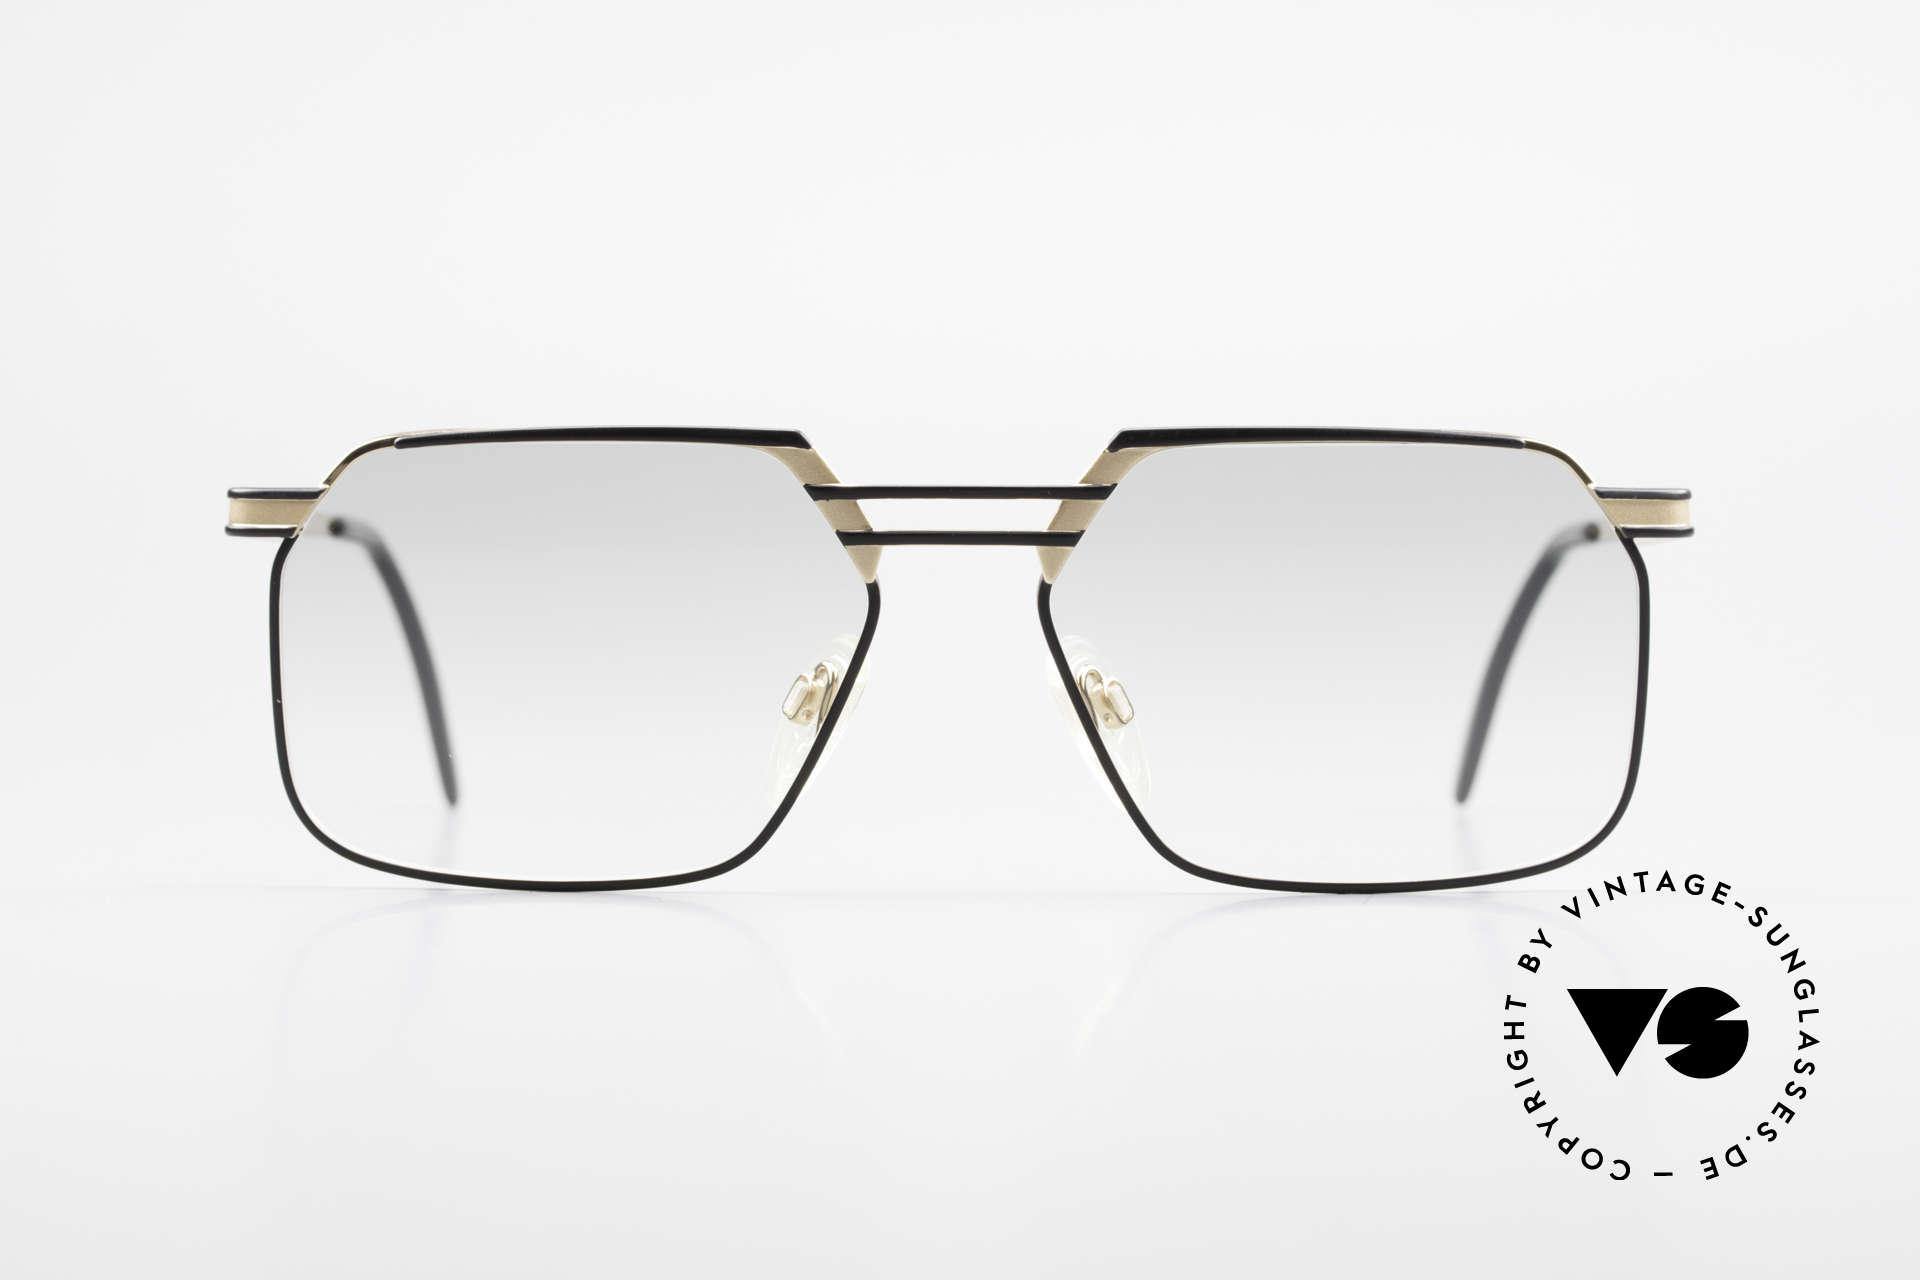 Cazal 760 Striking Vintage Men's Frame, outstanding craftsmanship, made in Germany, Made for Men